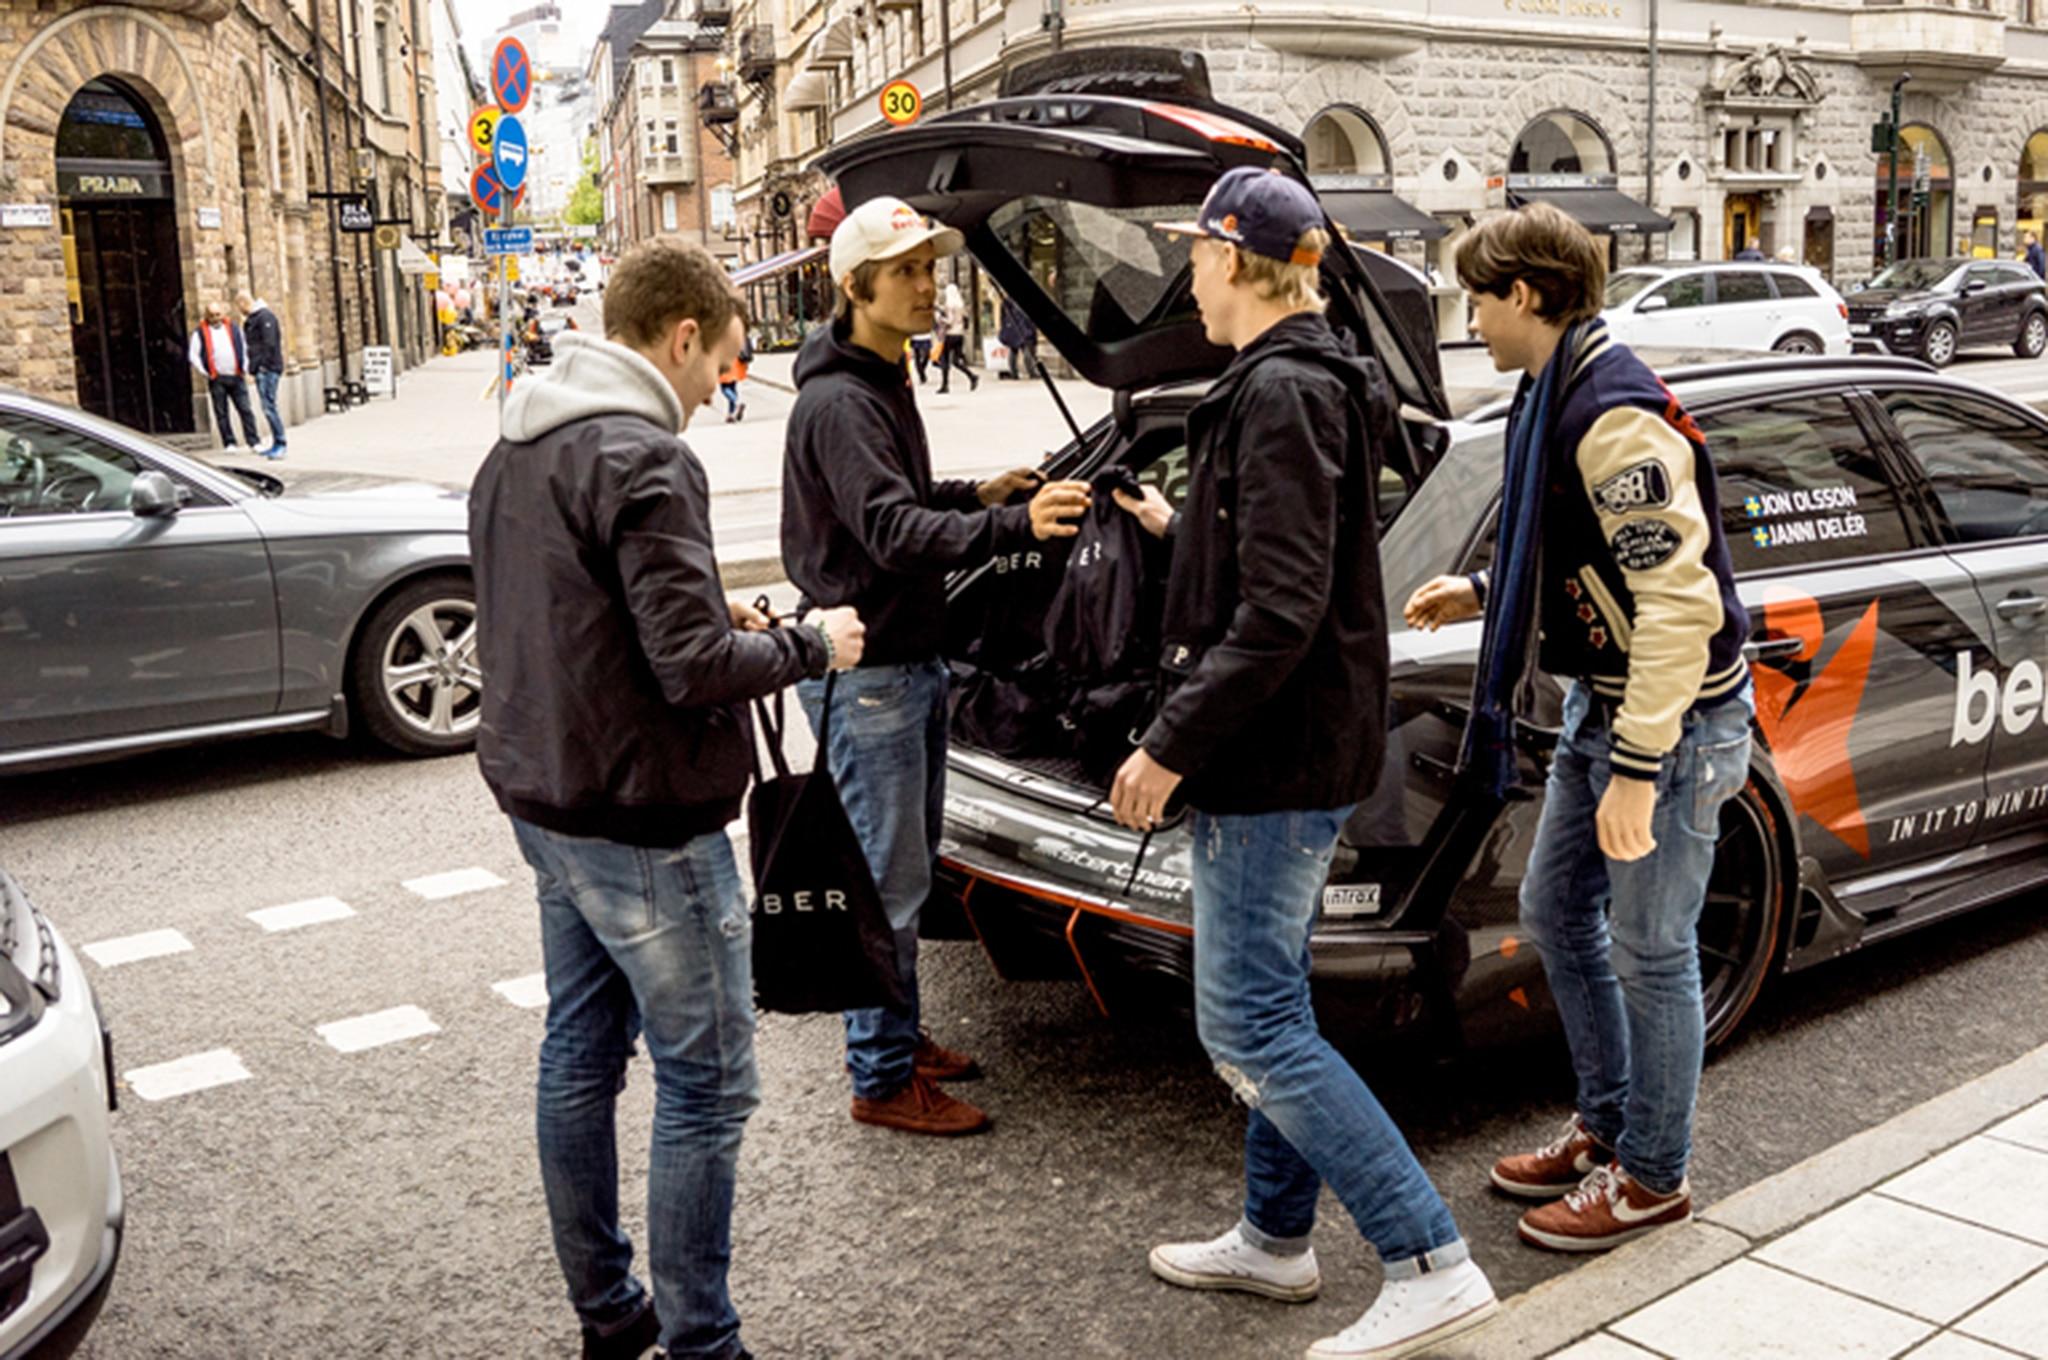 Jon Olsson S Insane Audi Rs6 Dtm Stolen And Burned To The